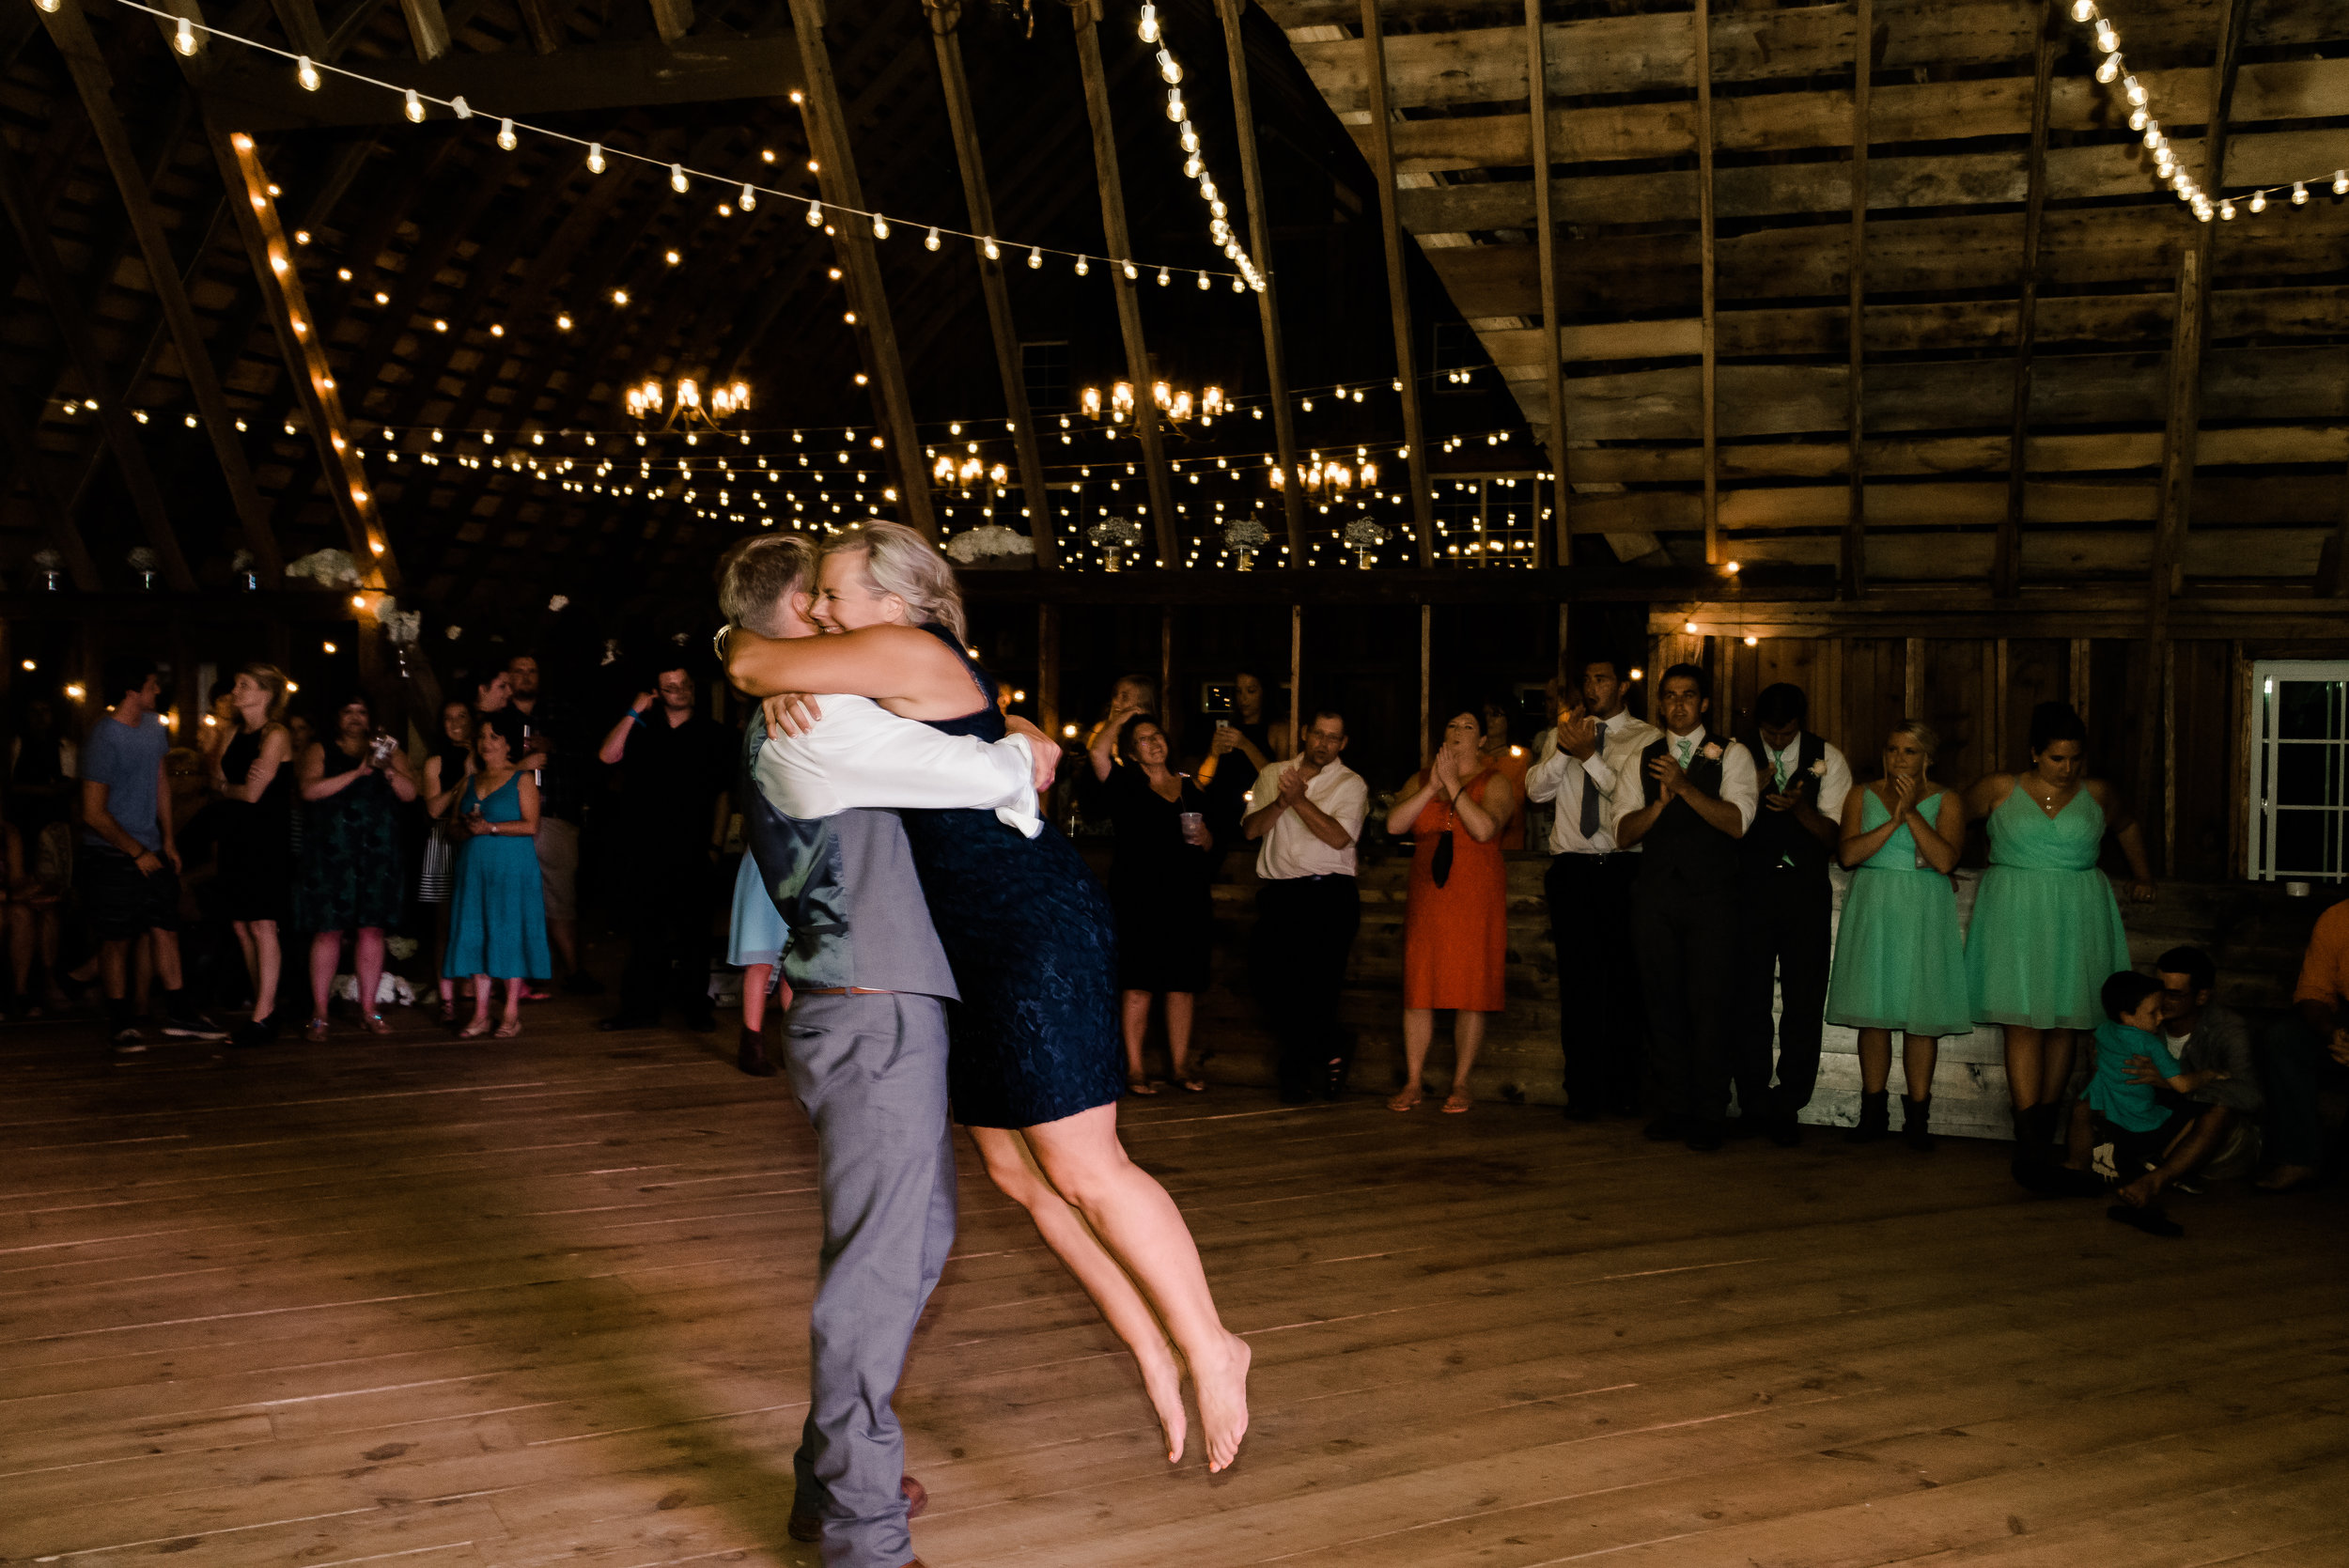 Mother Son Dance at Bloom Lake Barn, Shafer, MN Wedding Photography